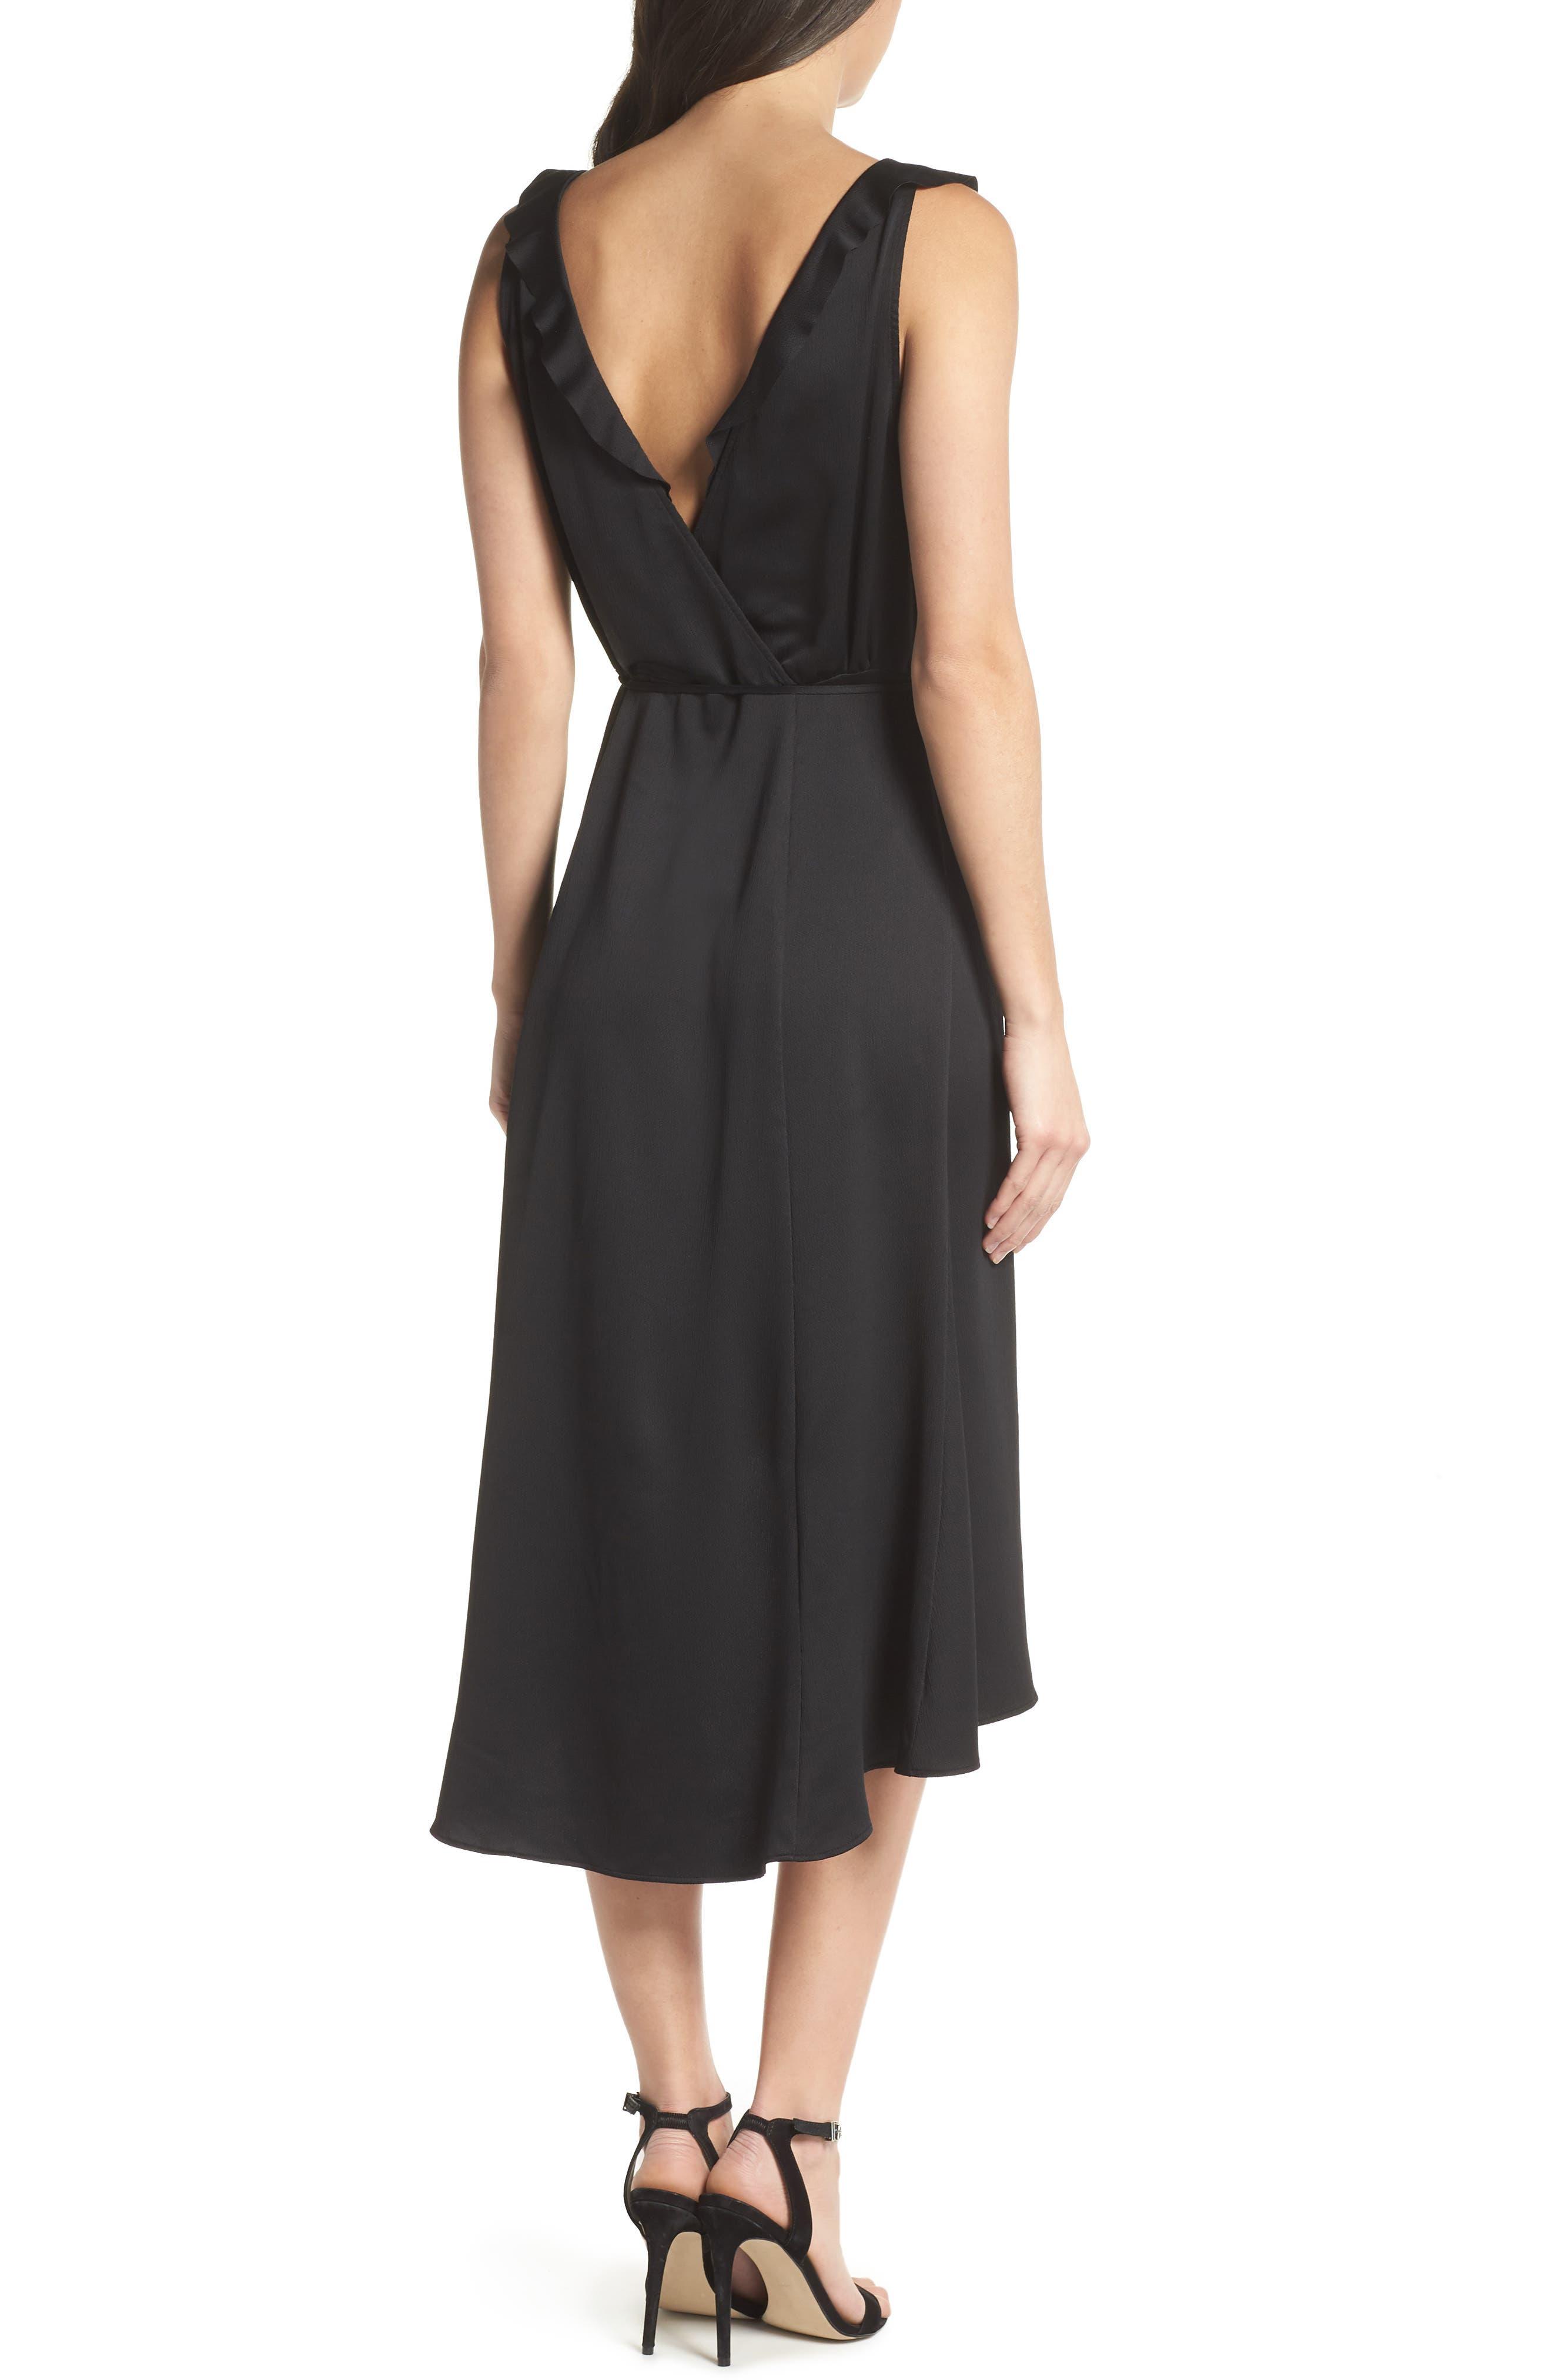 Maudie Ruffle Midi Dress,                             Alternate thumbnail 2, color,                             Black